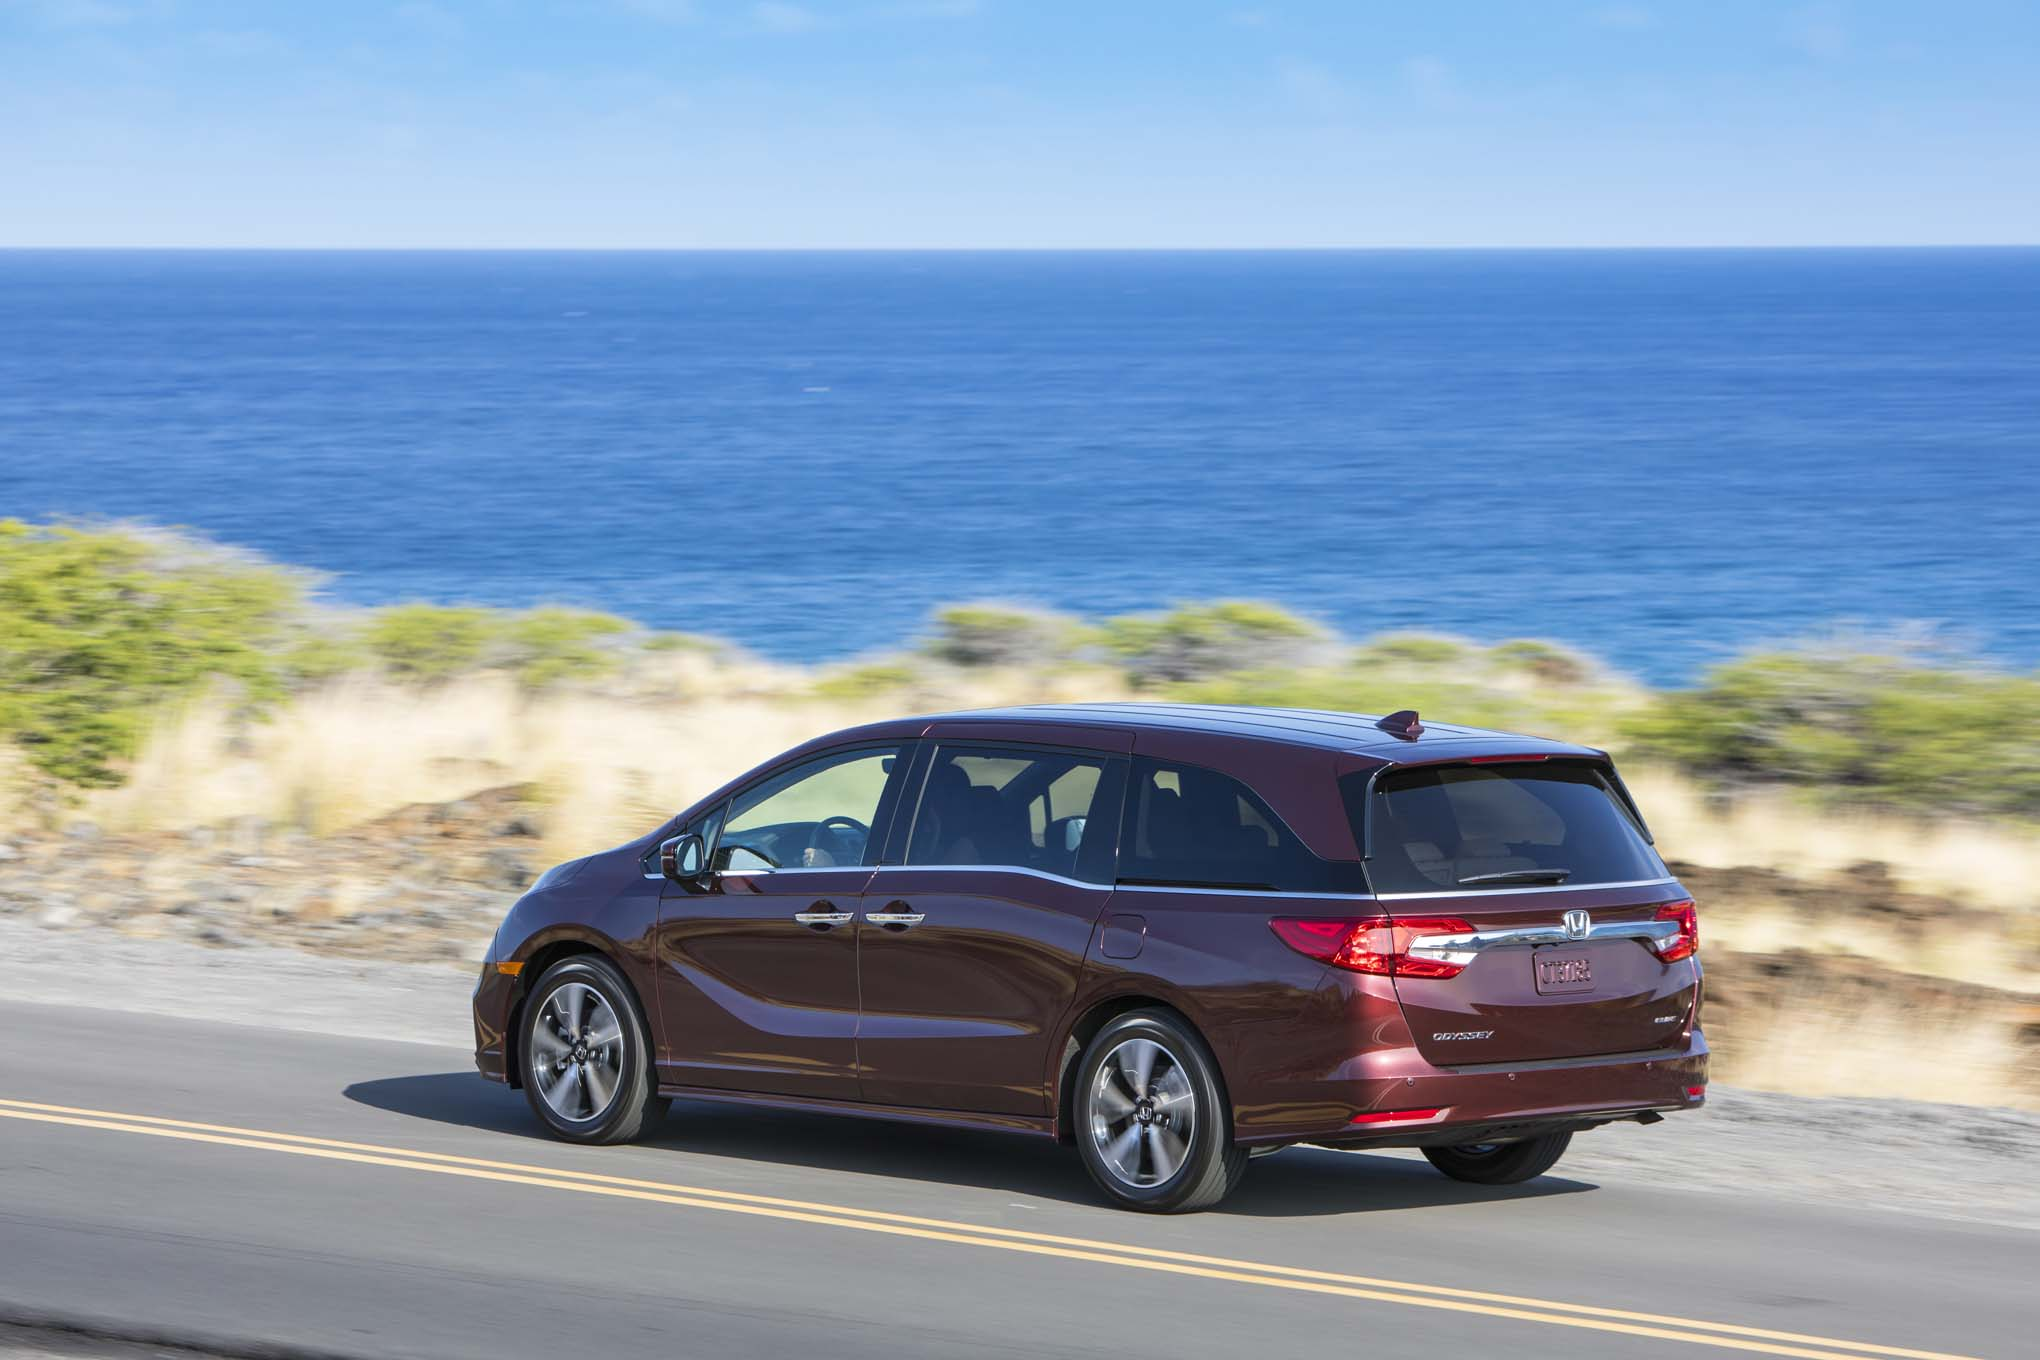 2018 Honda Odyssey Rear Three Quarter In Motion 10